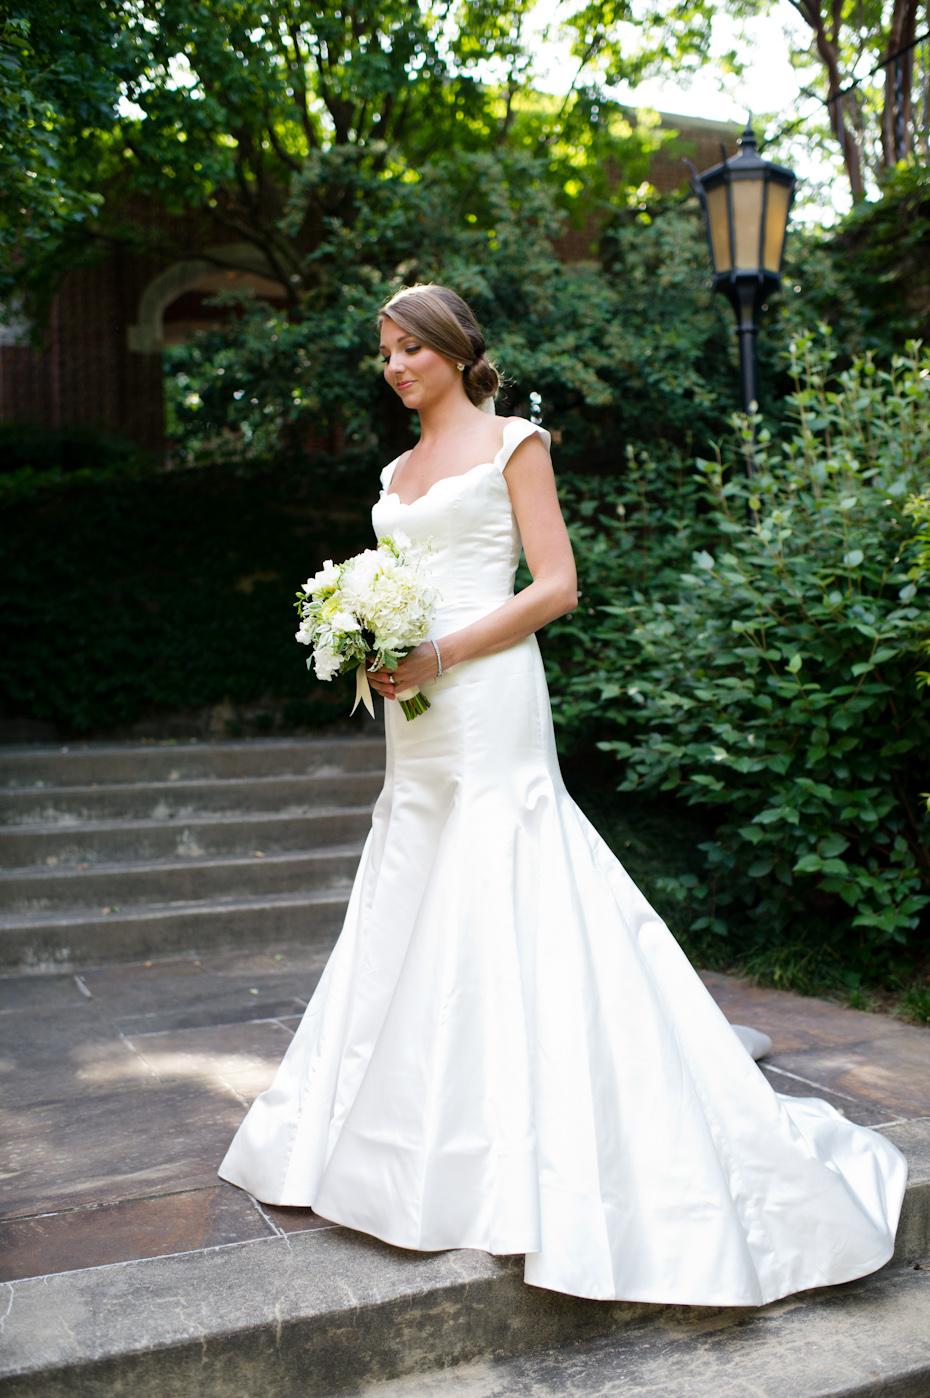 Second hand wedding dresses in georgia bridesmaid dresses for 2nd hand wedding dress